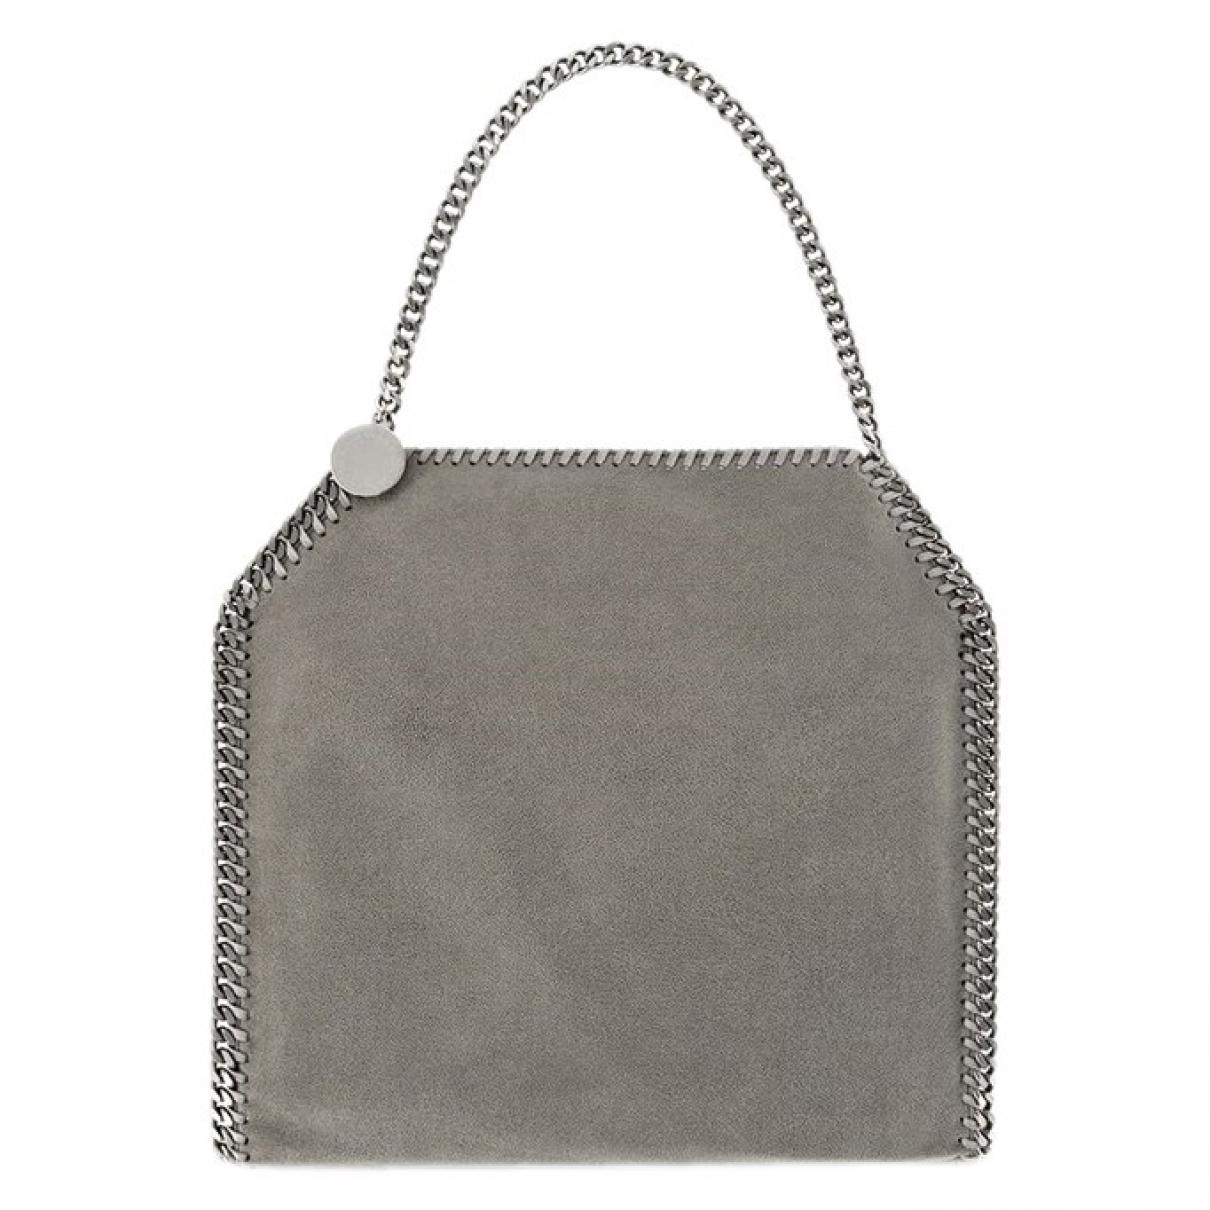 Stella Mccartney - Sac a main Falabella pour femme - gris